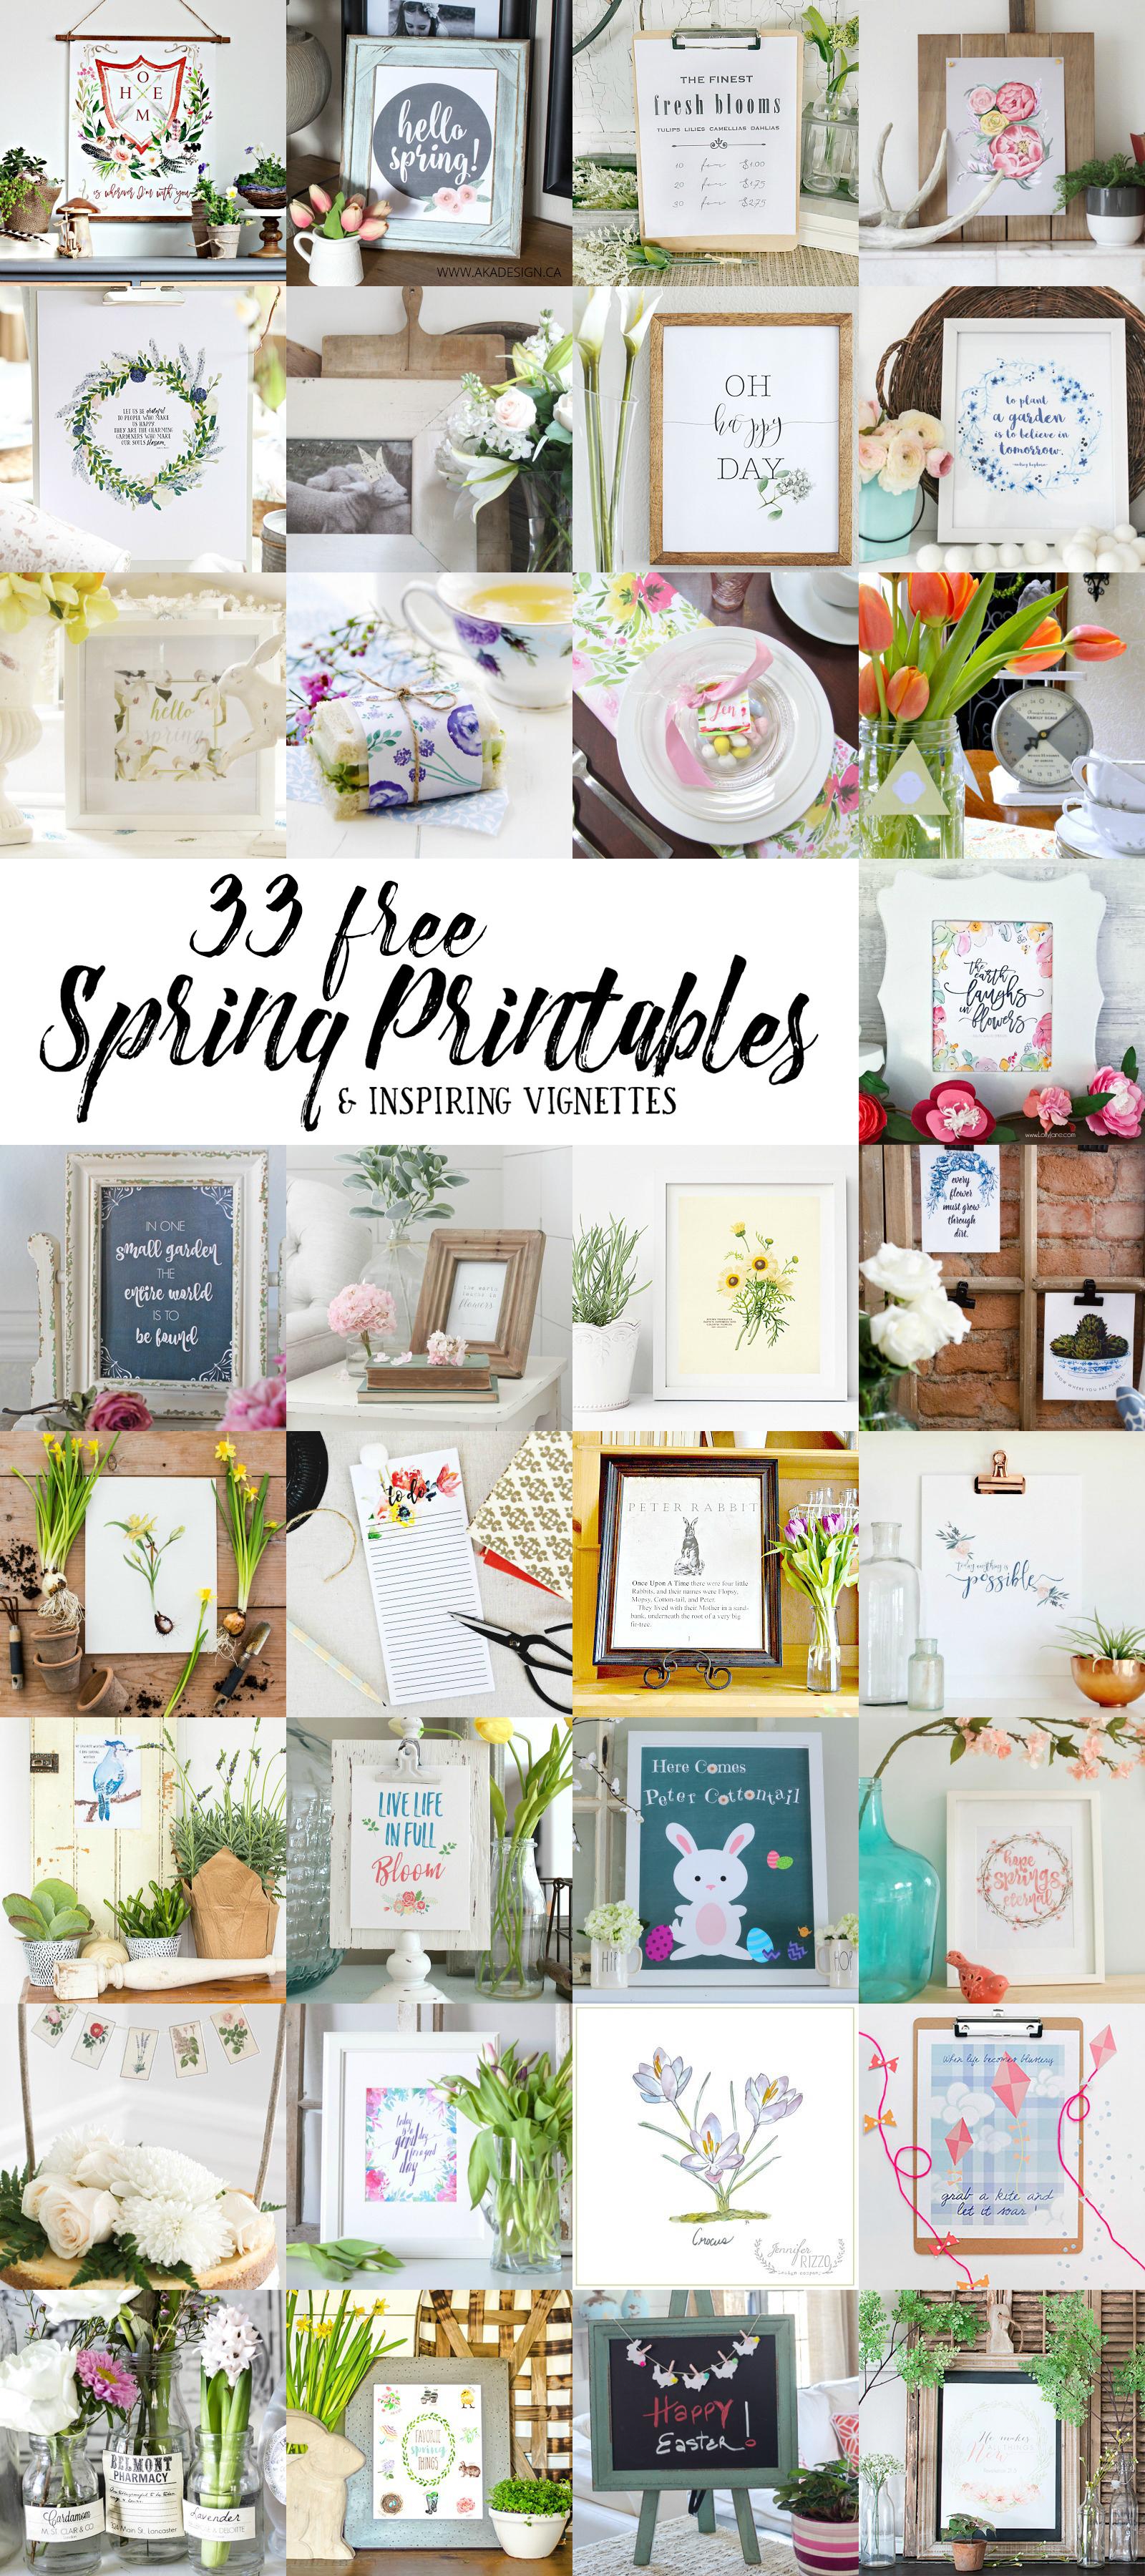 33 free spring printables